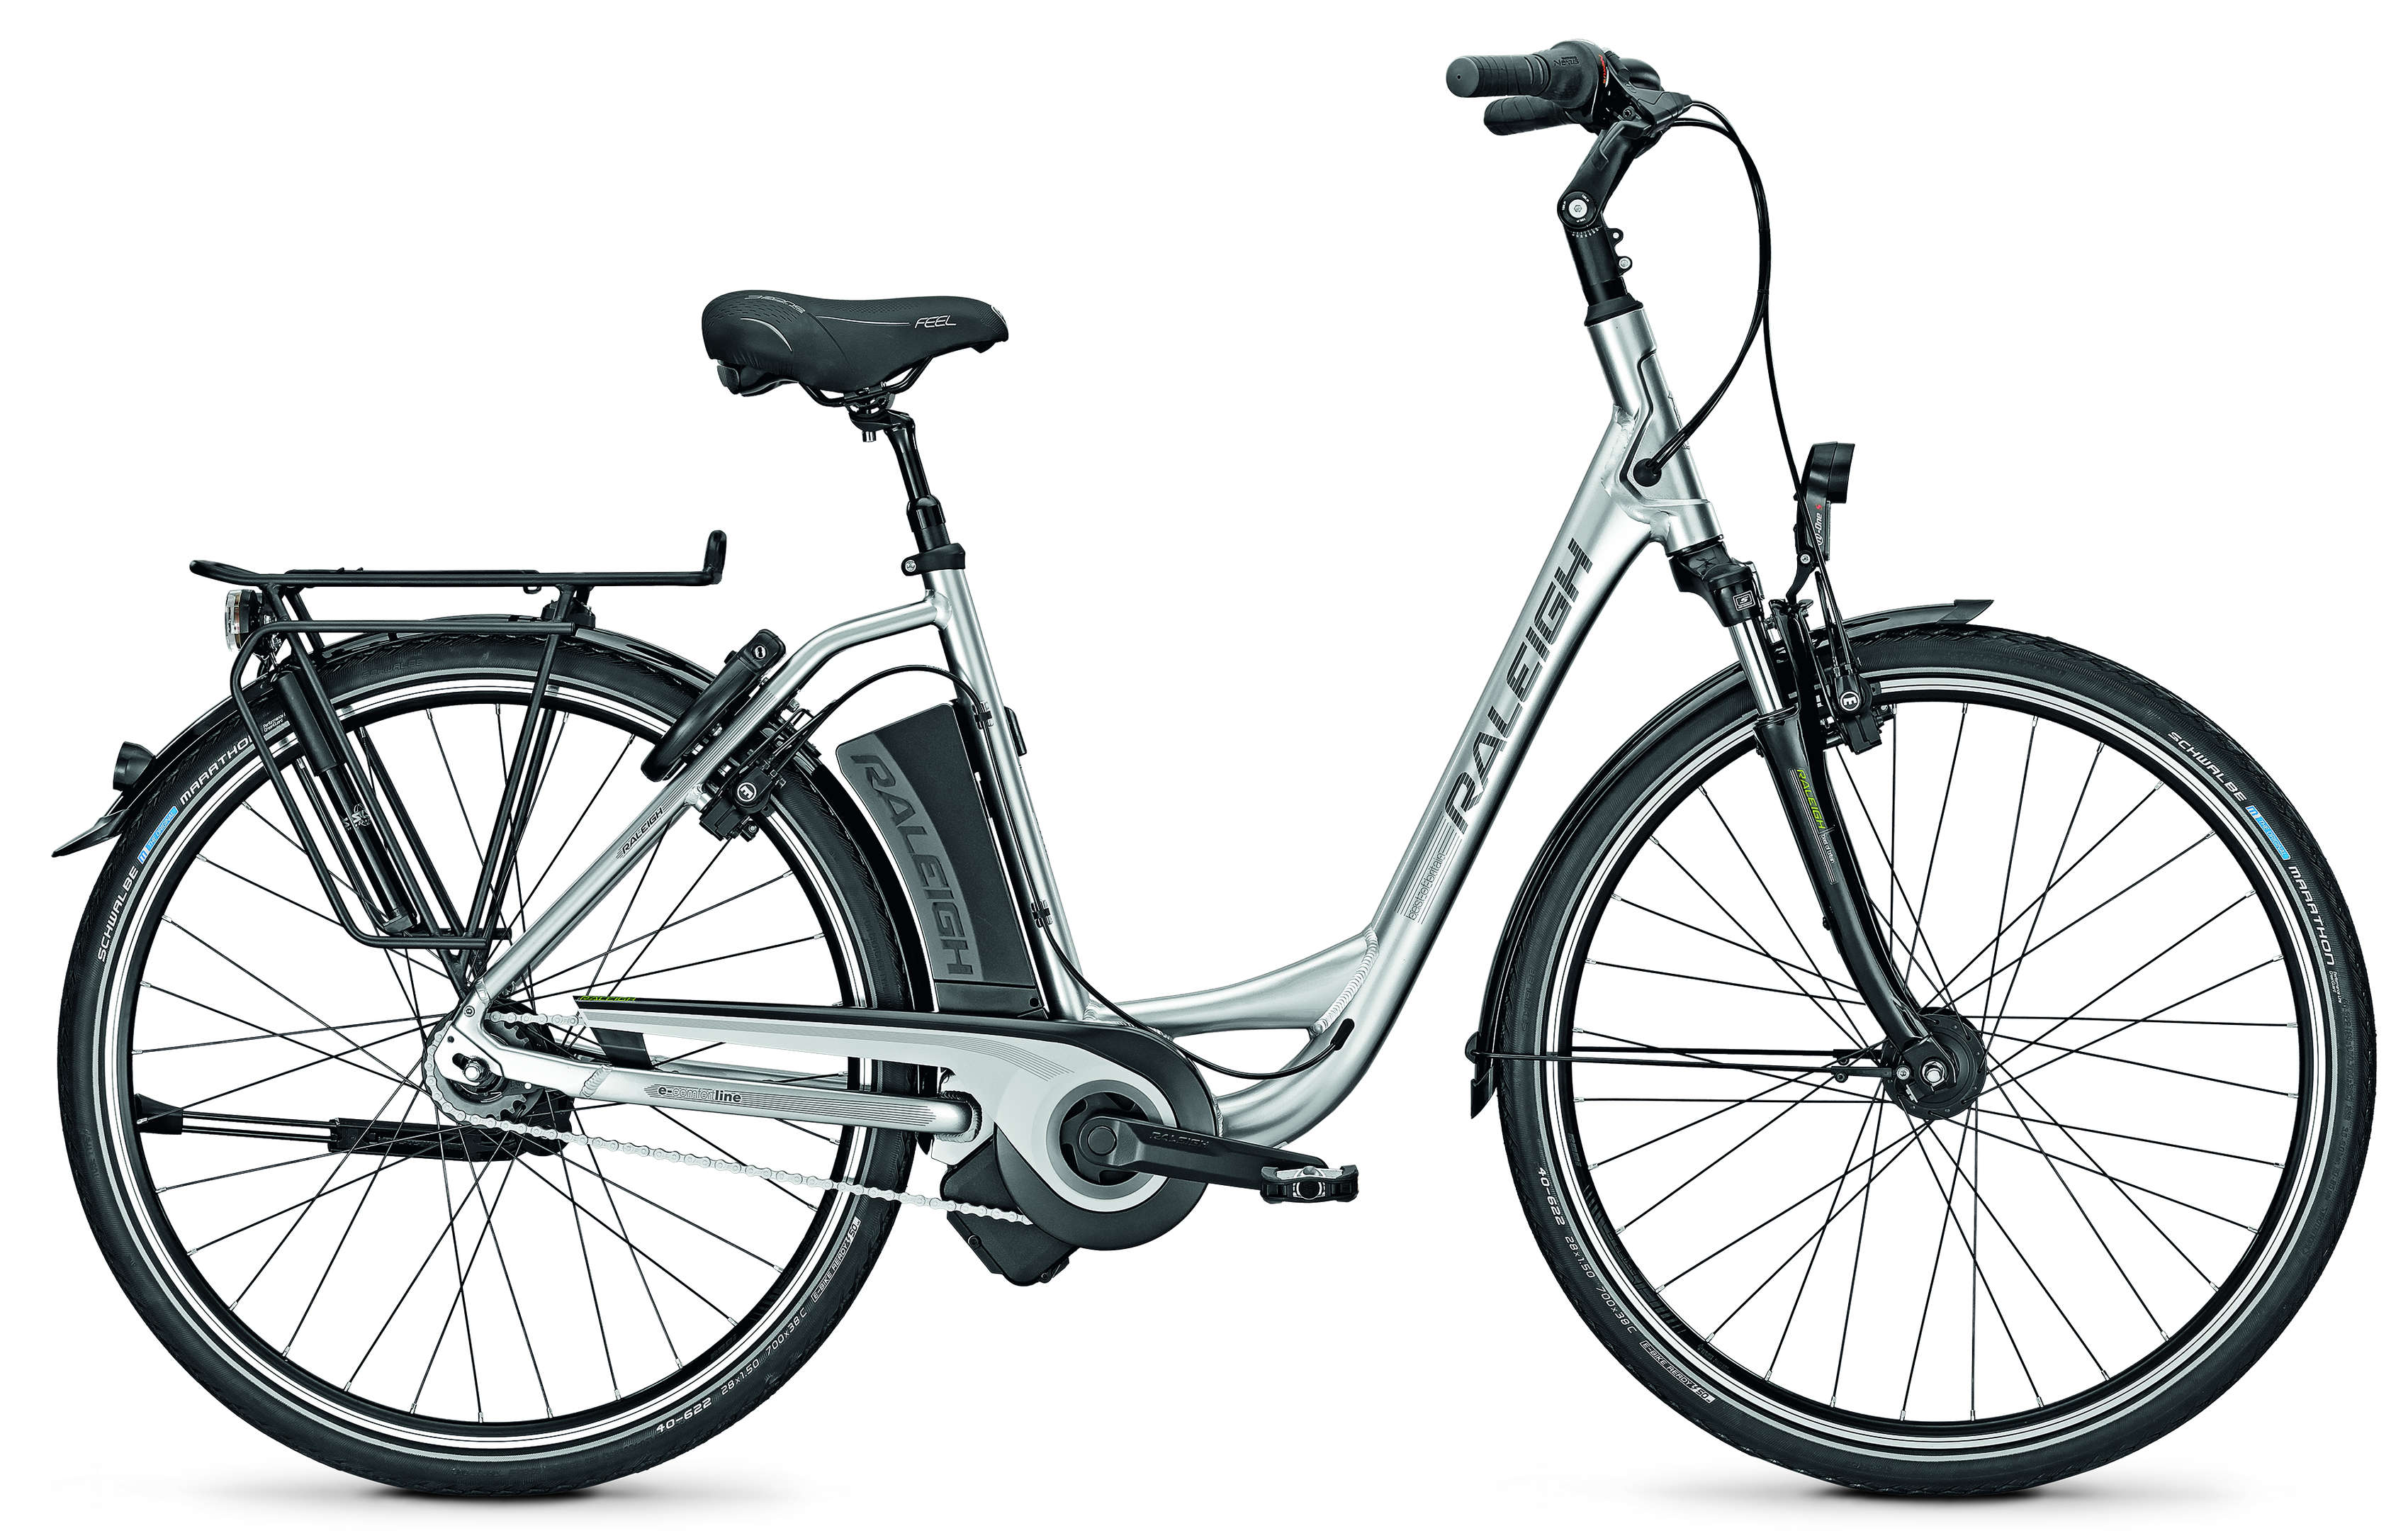 raleigh e bike dover impulse 8r hs hercules bike leasing. Black Bedroom Furniture Sets. Home Design Ideas